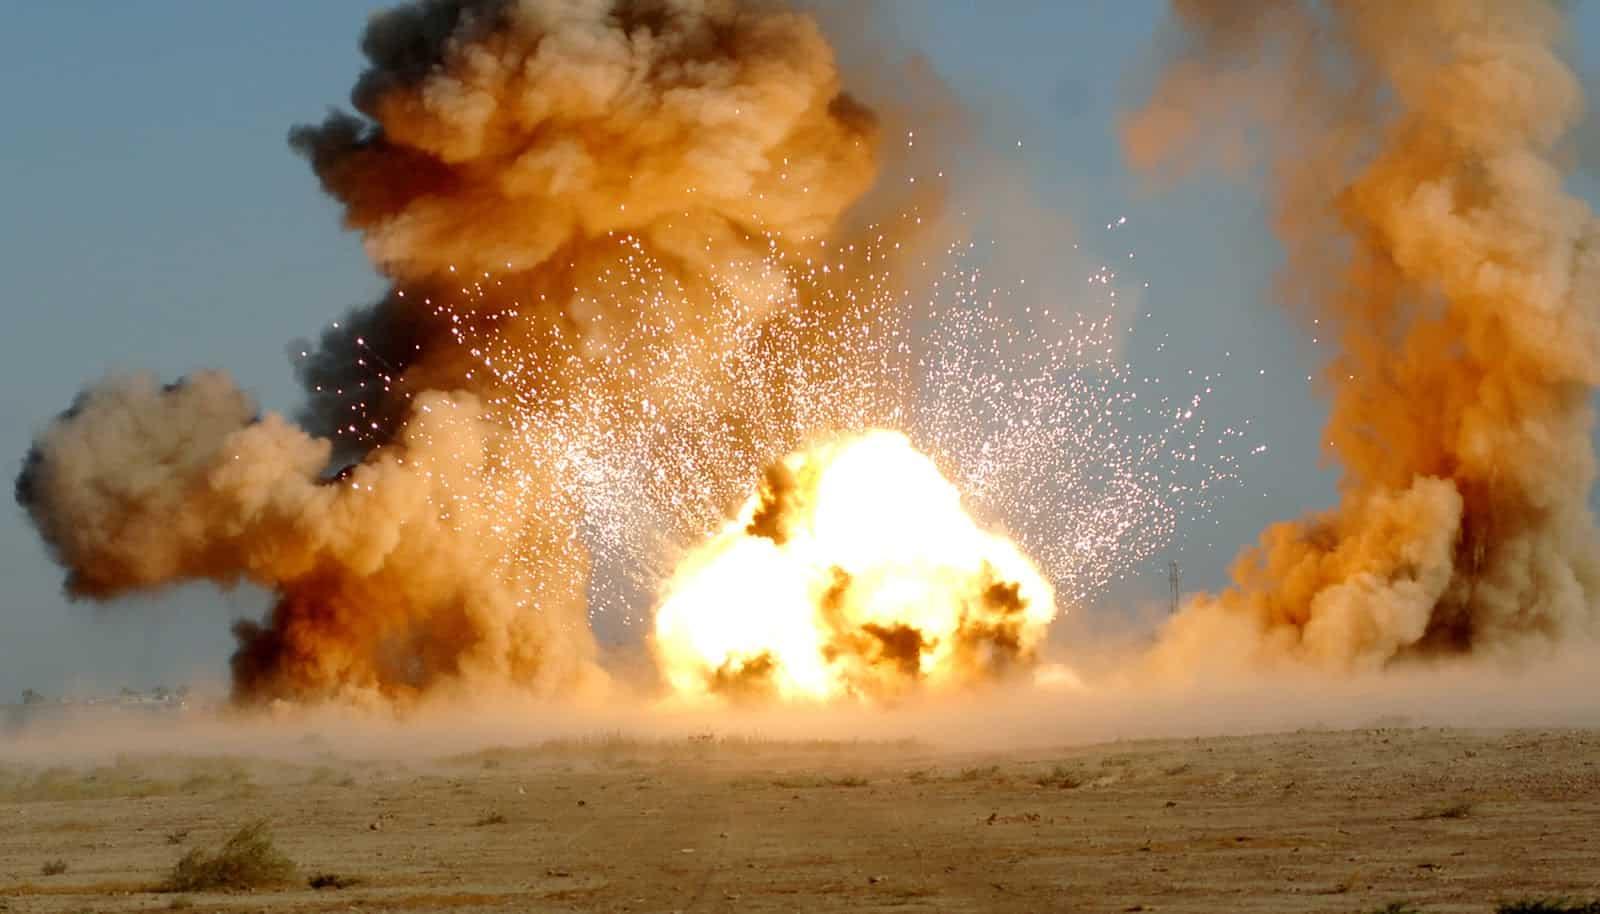 USAF EOD explosion (2009) Senior Airman Christopher Hubenthal | Wikimedia